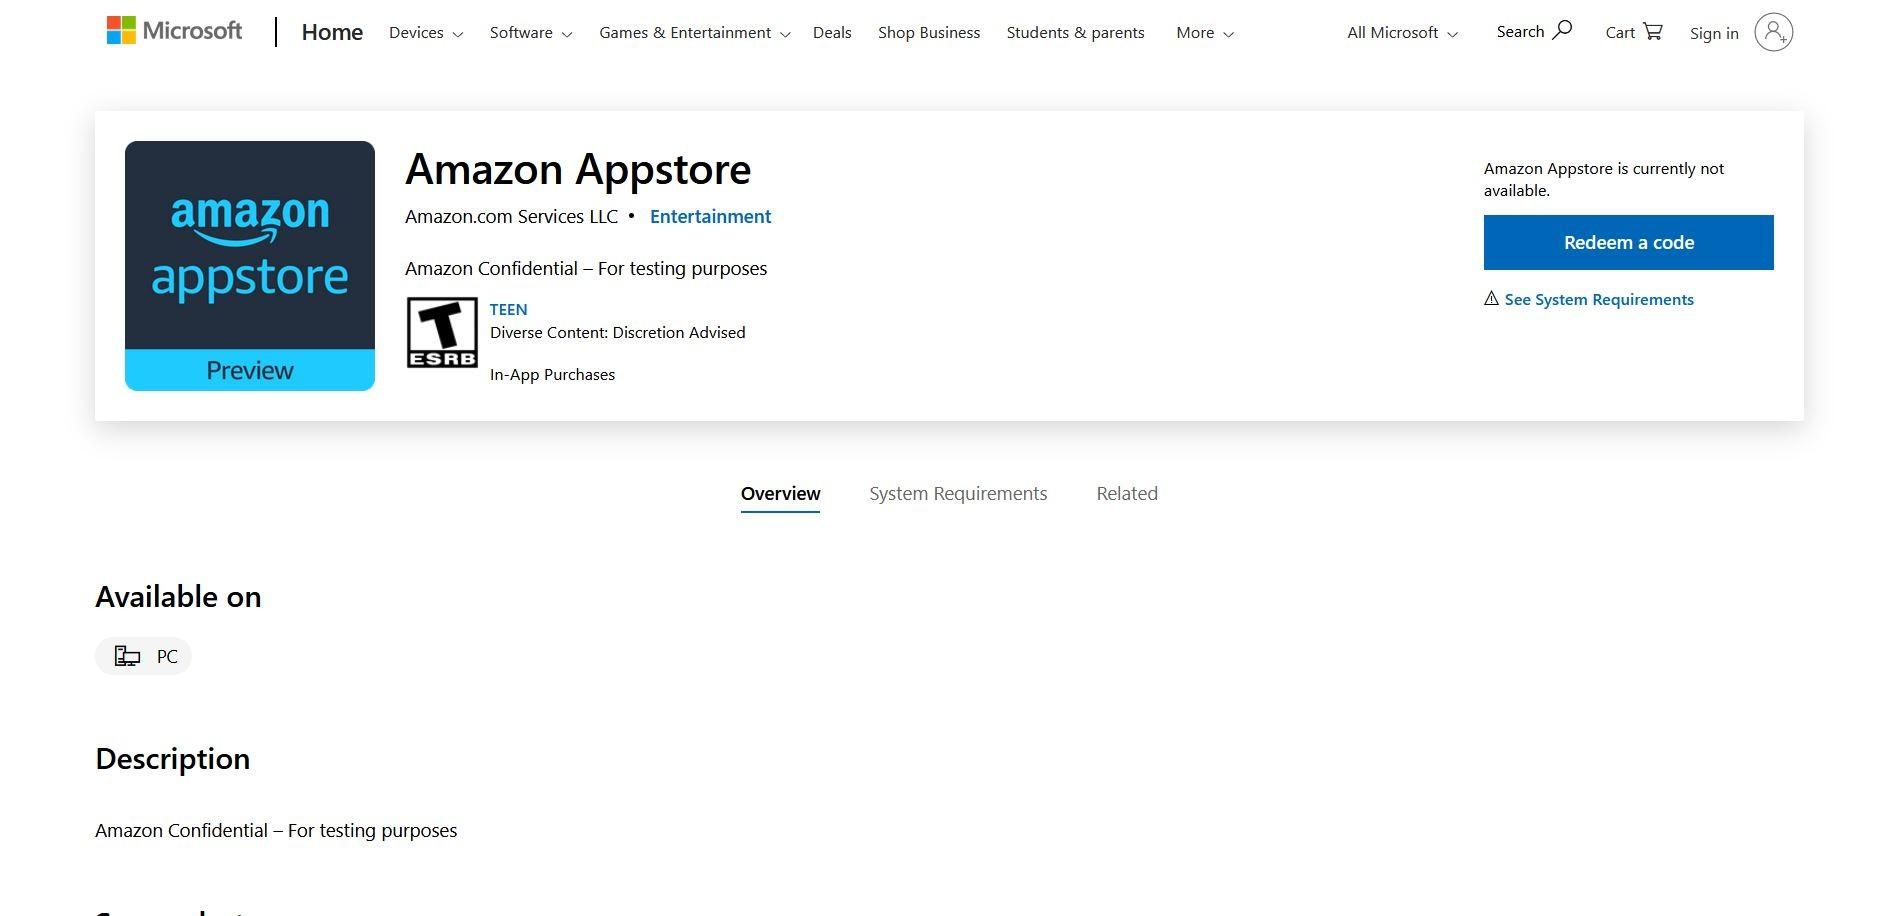 Amazon App store Microsoft Storea